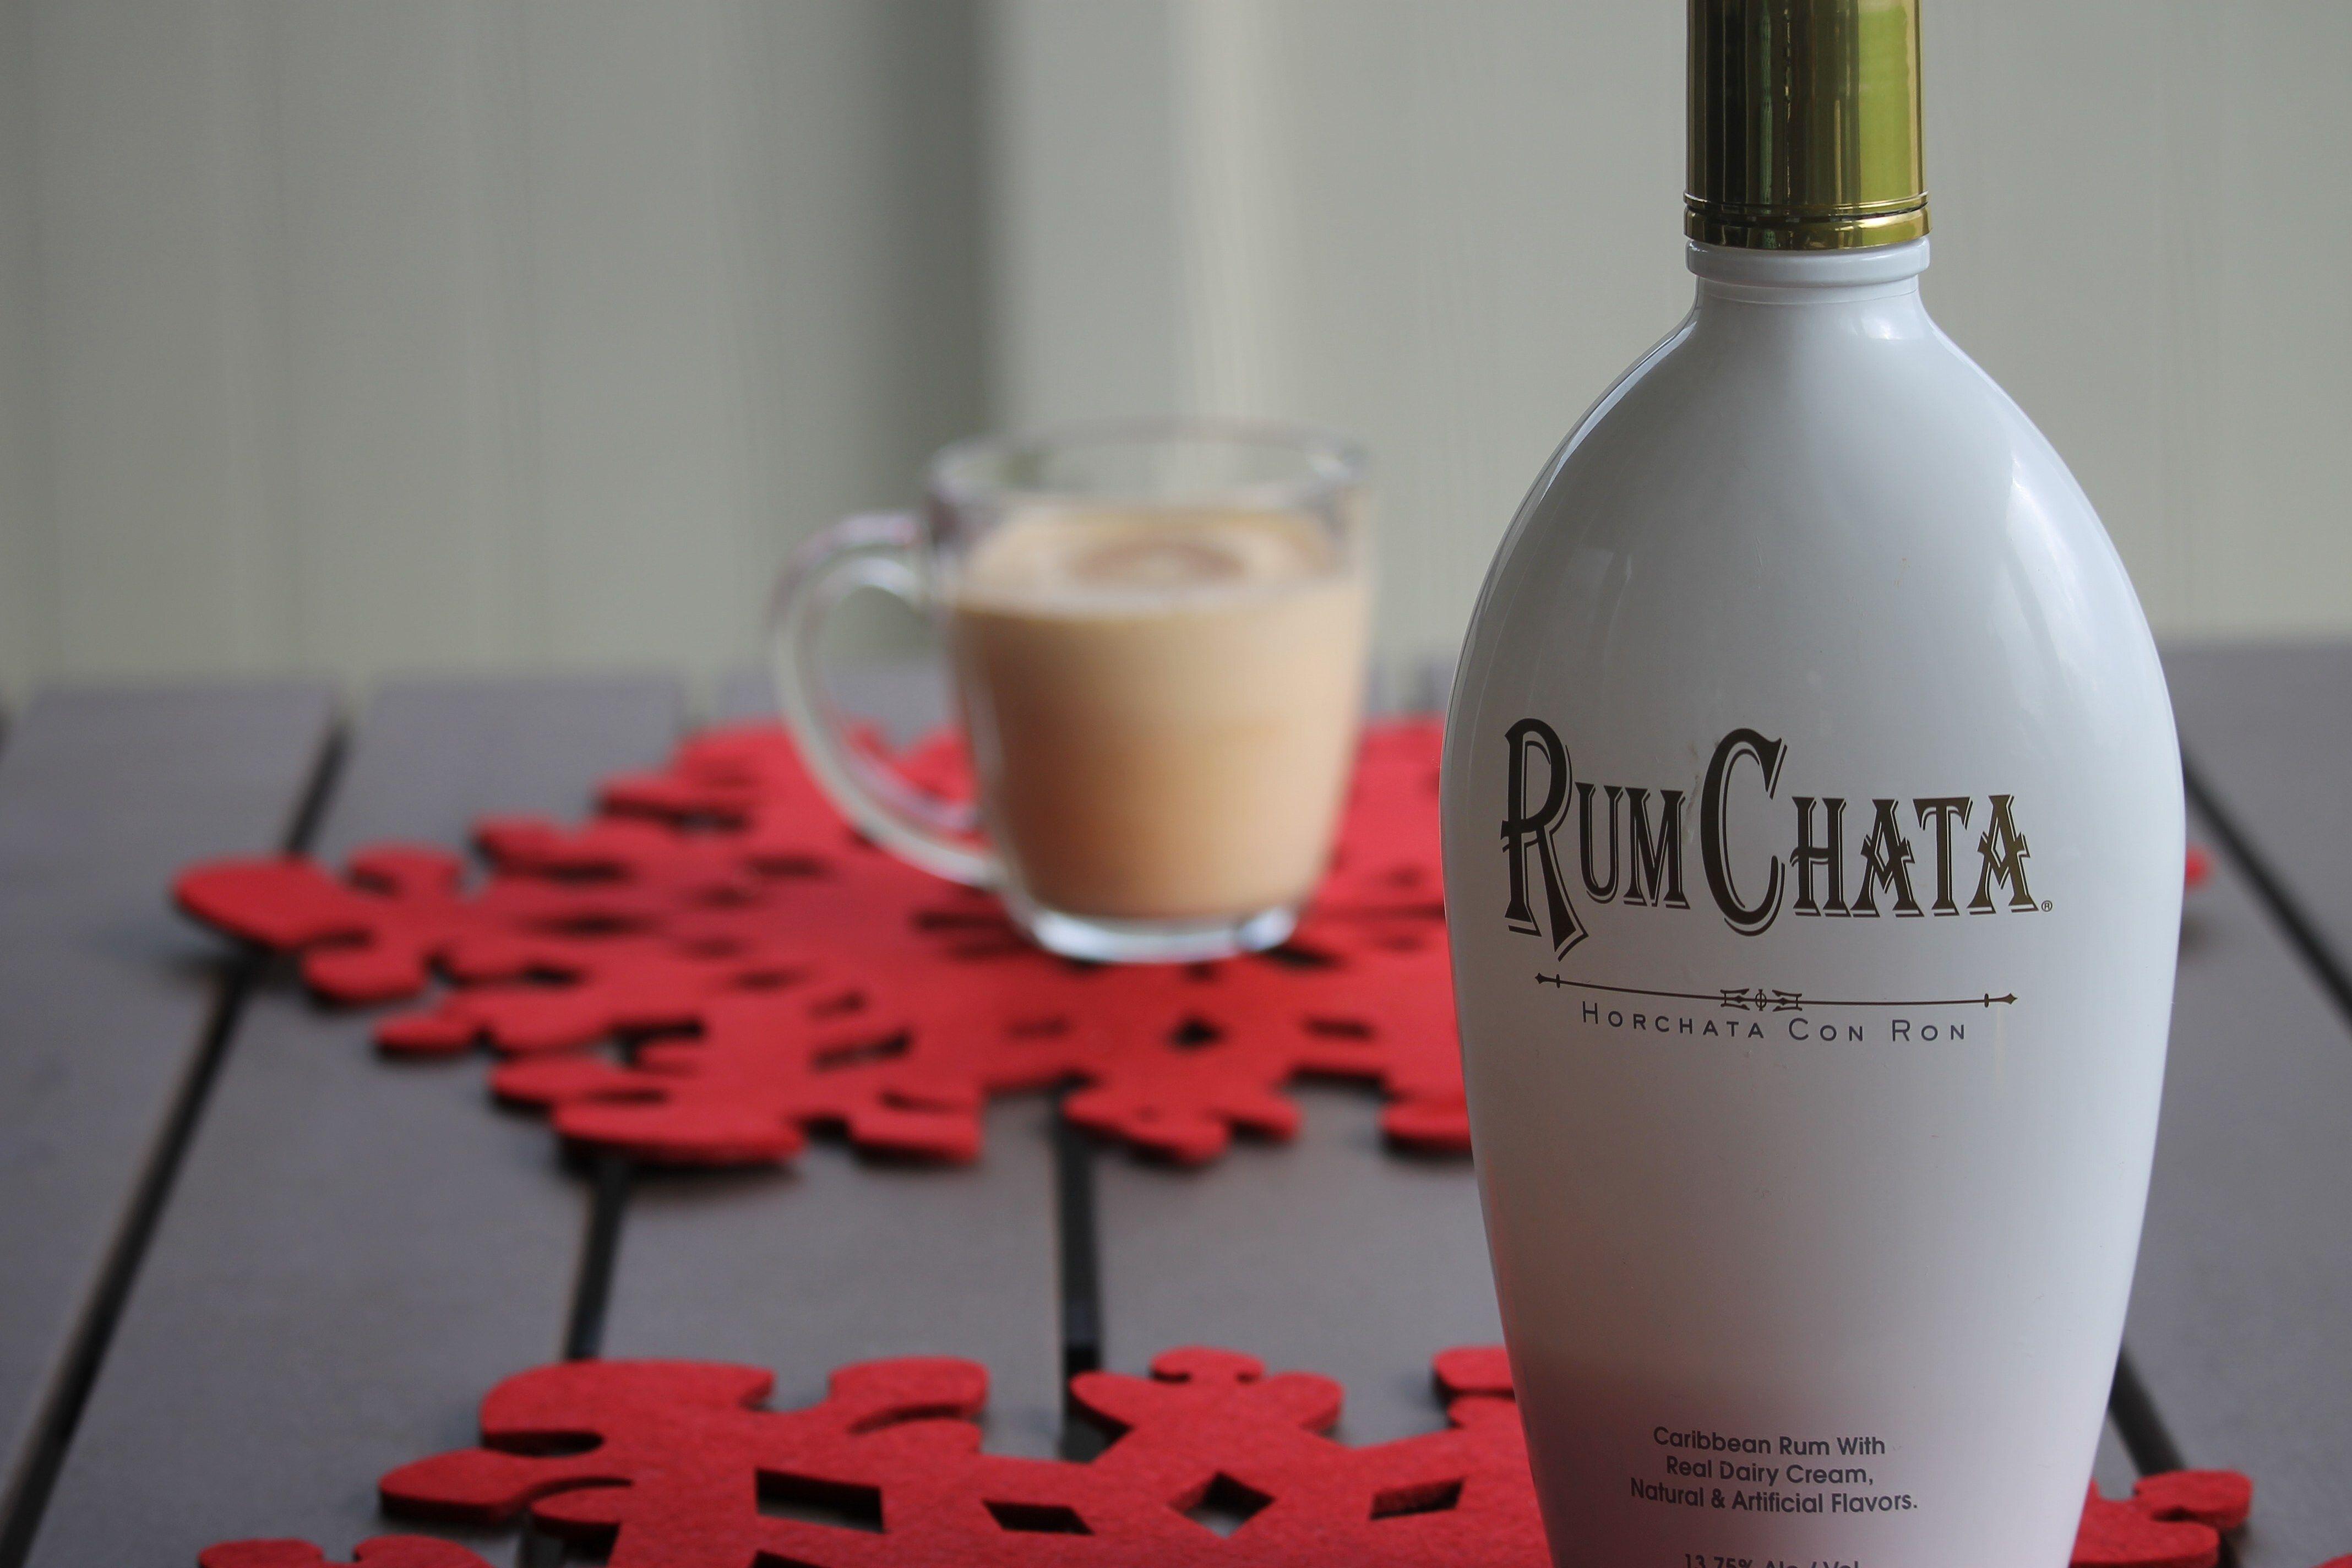 Rumchata Eggnog Is The Holiday Mashup In 2020 Rumchata Holiday Traditions Rumchata Drinks